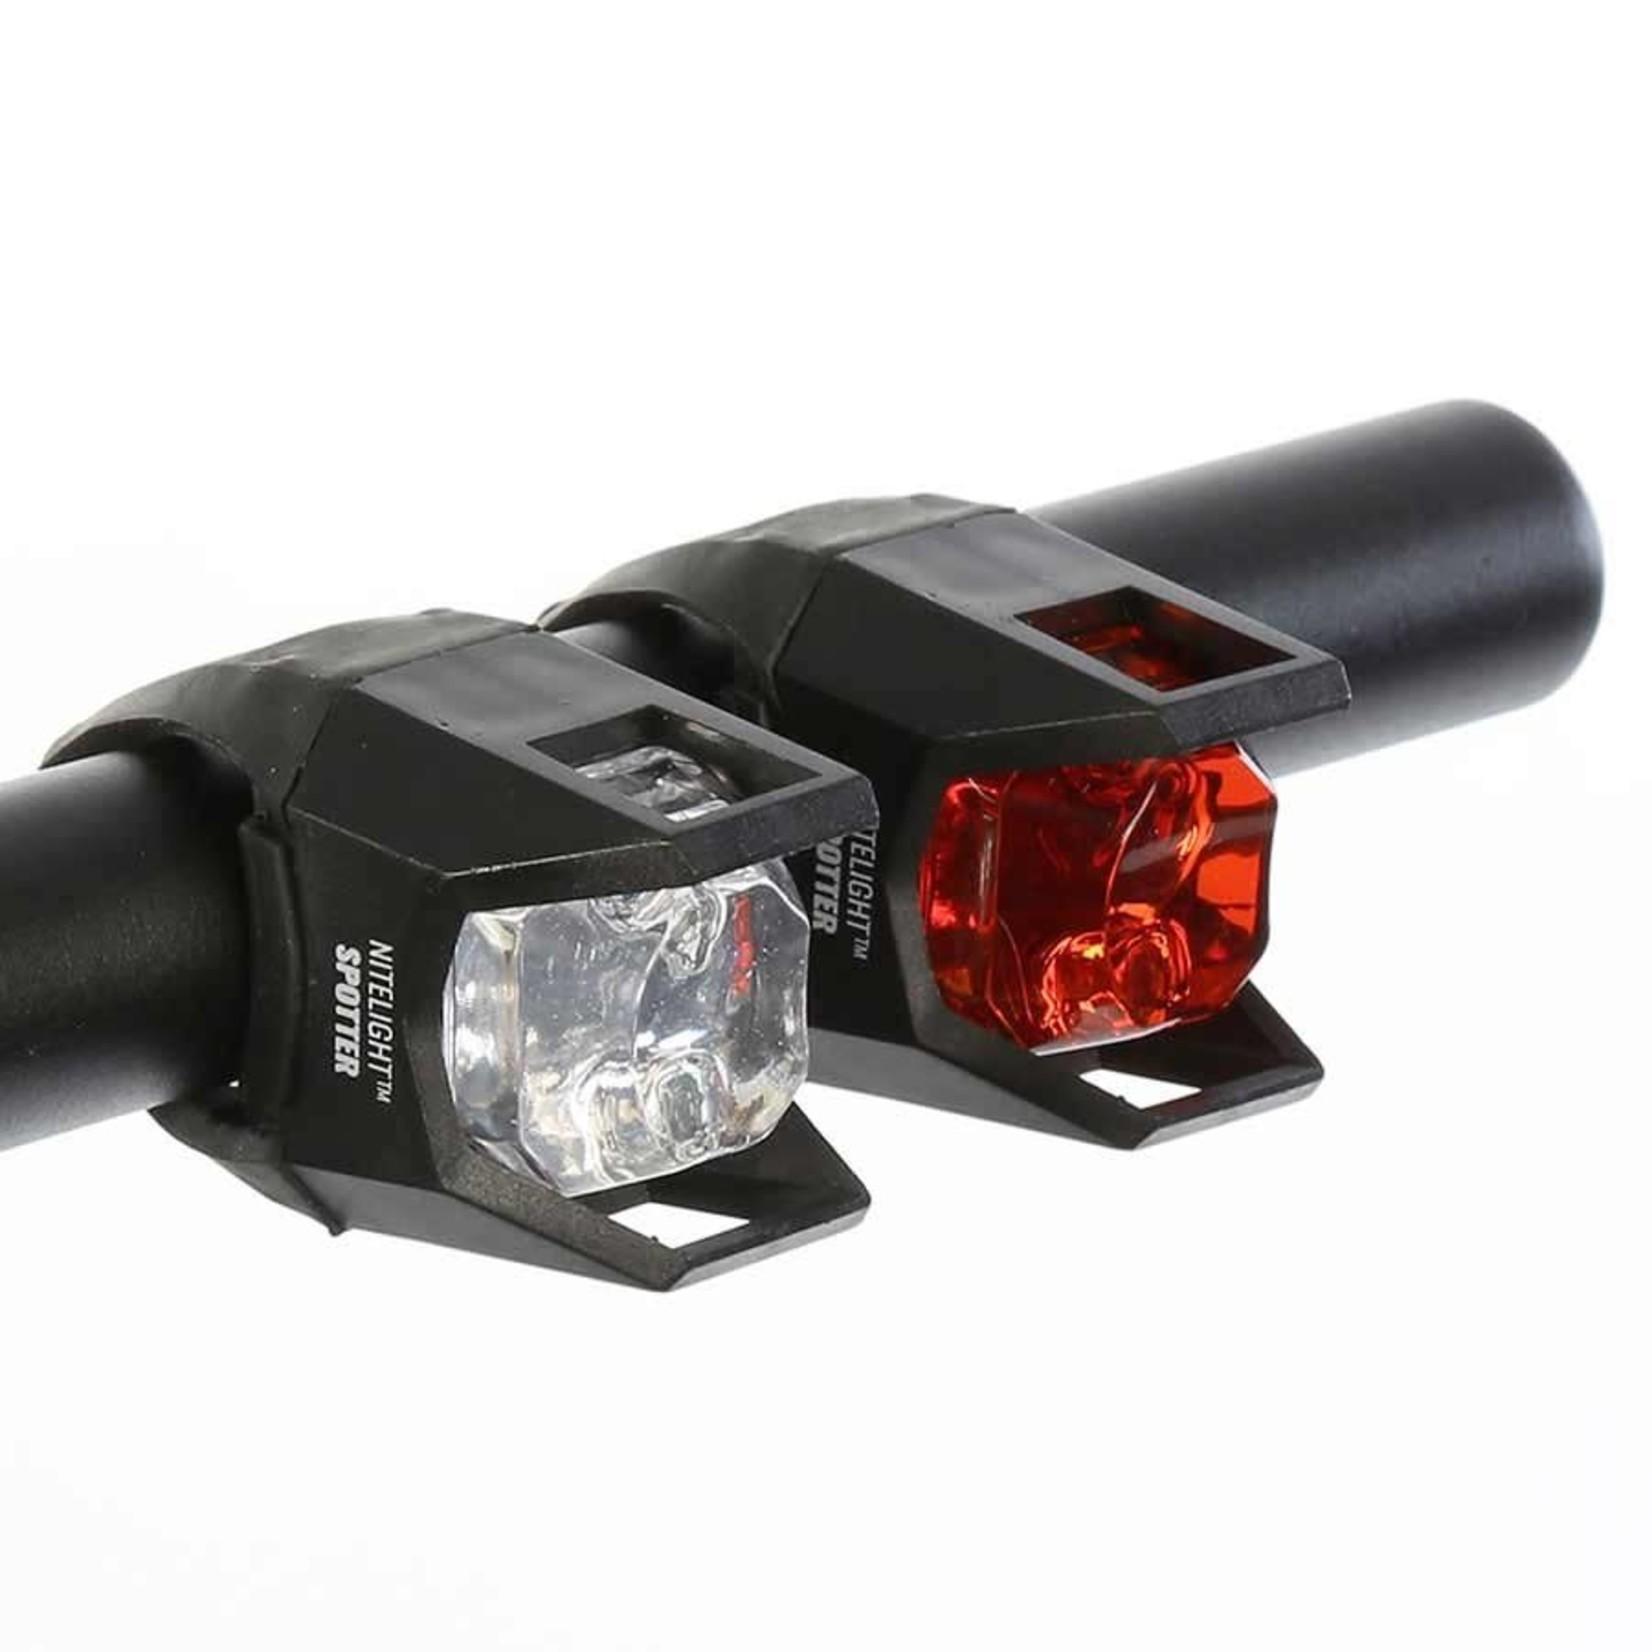 Evo Evo Bike Light Set, NiteLight Spotter, Blk